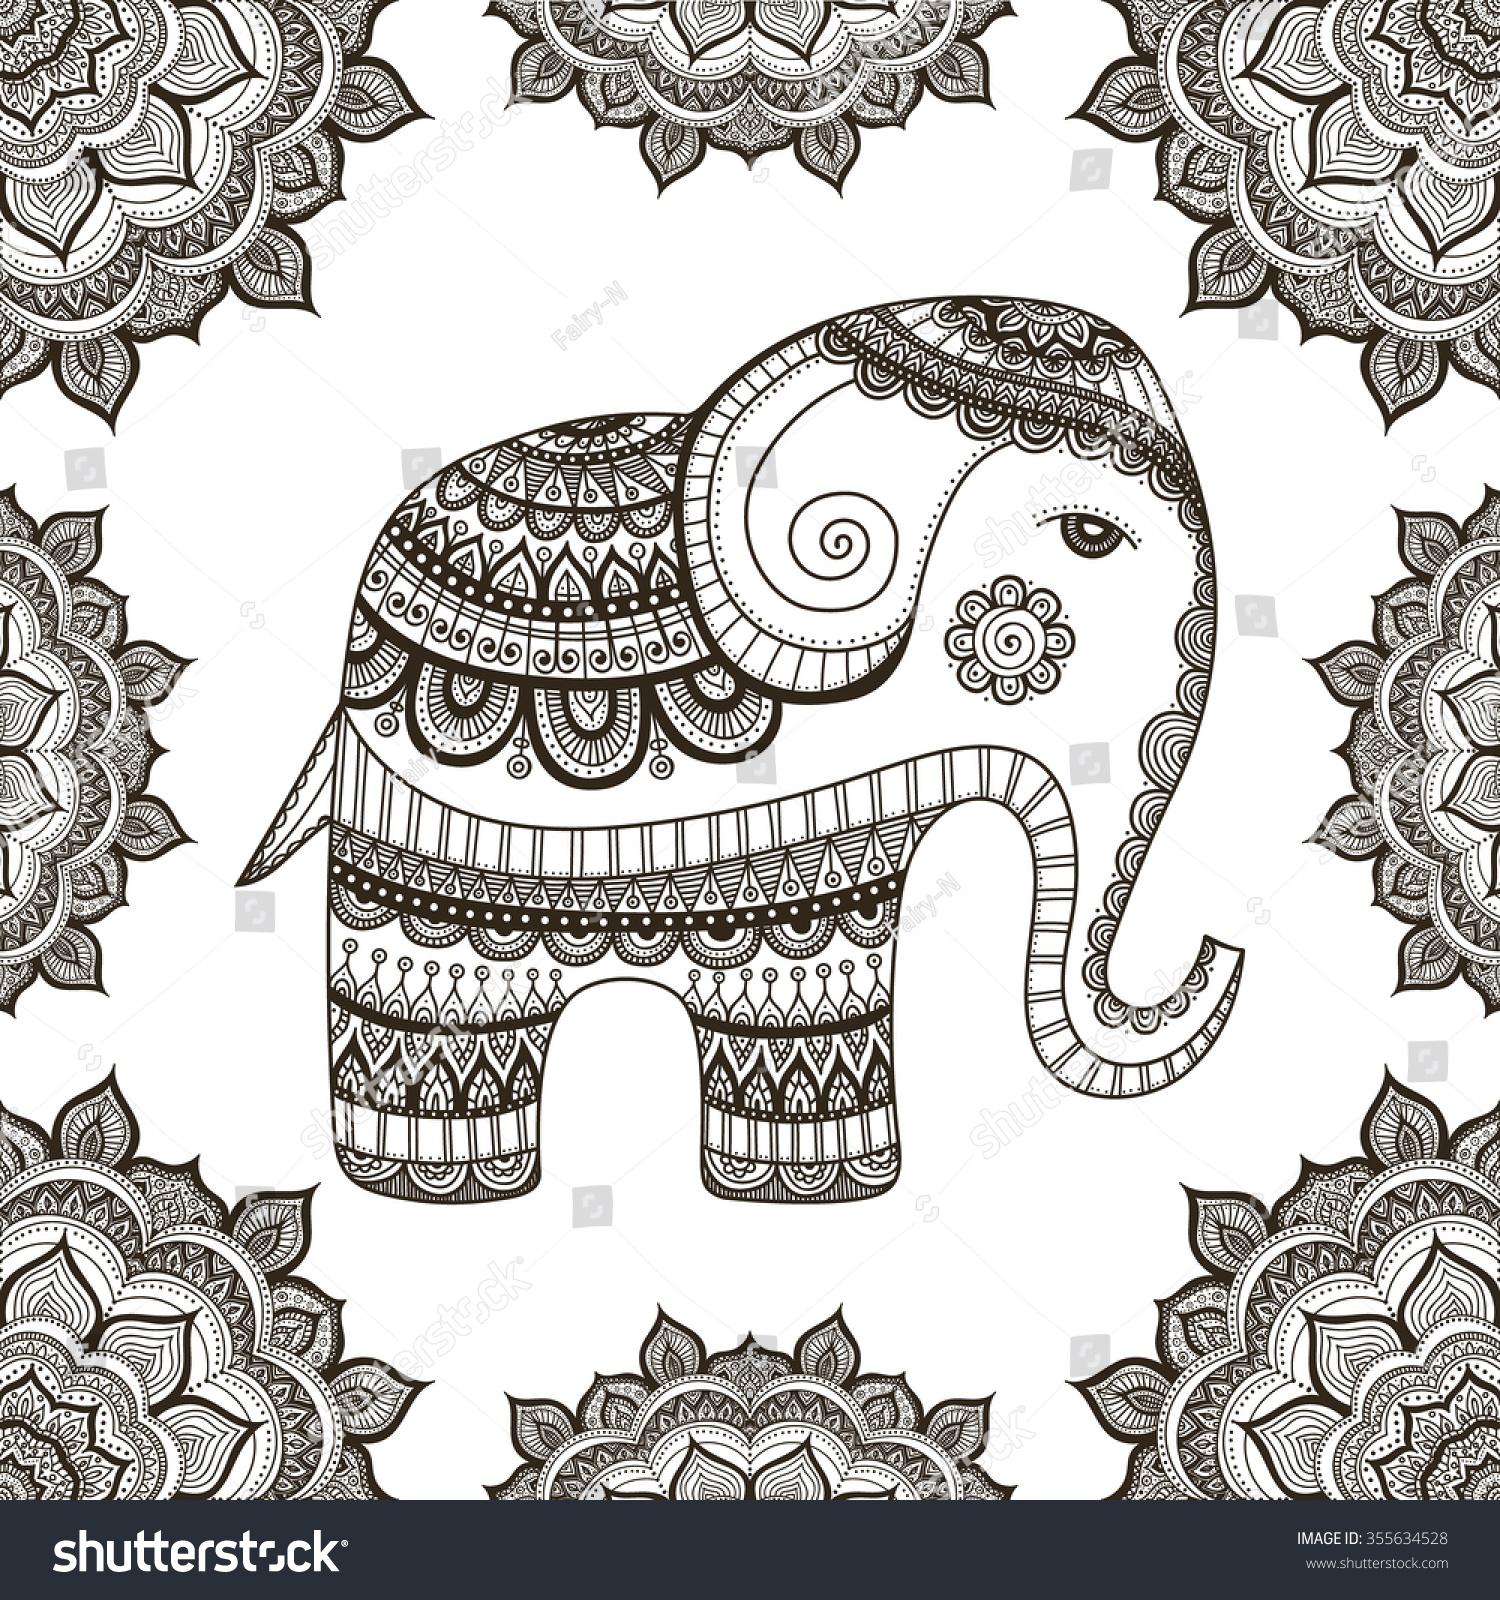 Indian Elephant Hand Drawn Elephant Doodle Stock Vector (Royalty ...